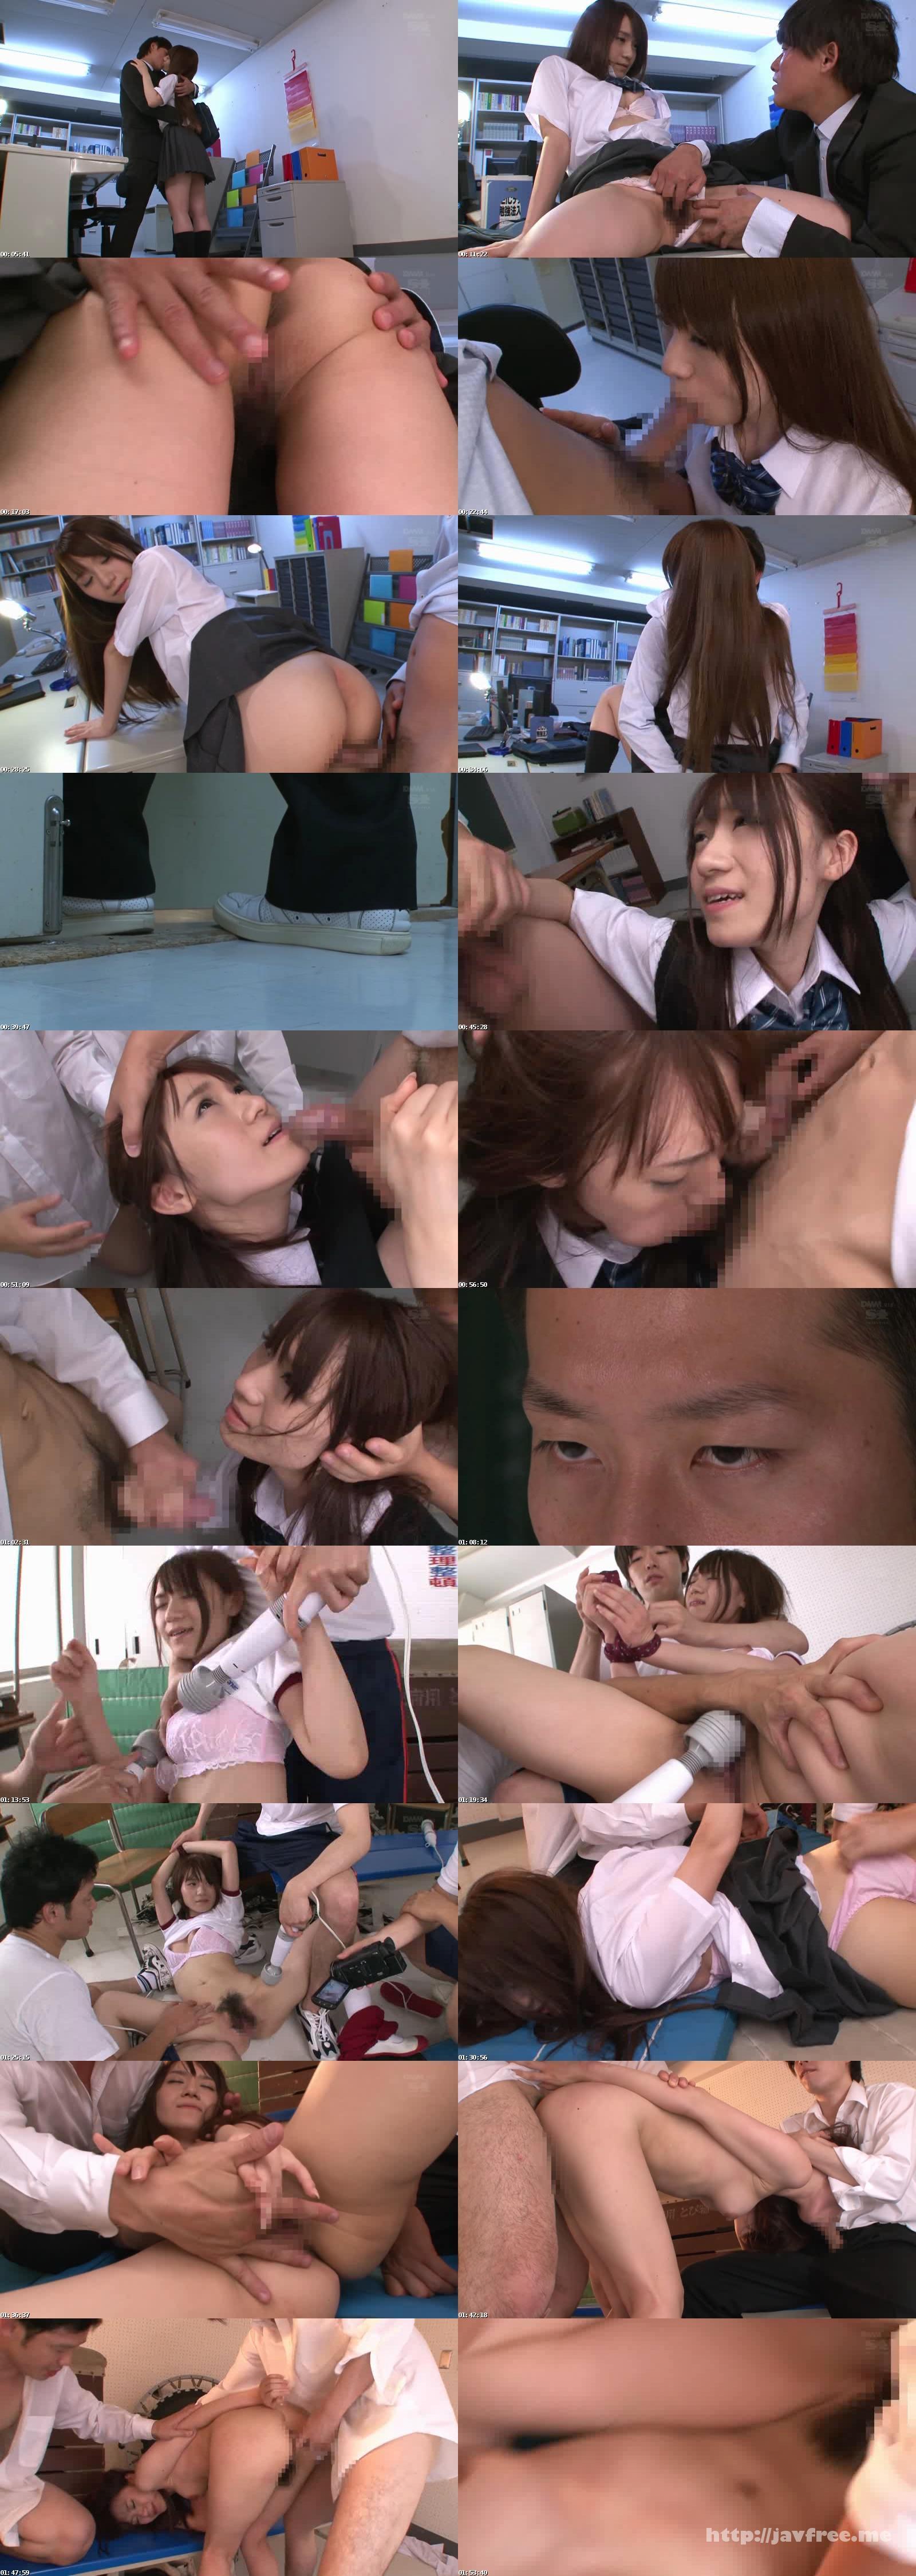 [SNIS 292] 犯された女子校生 放課後の輪姦教室 涼木みらい 涼木みらい SNIS